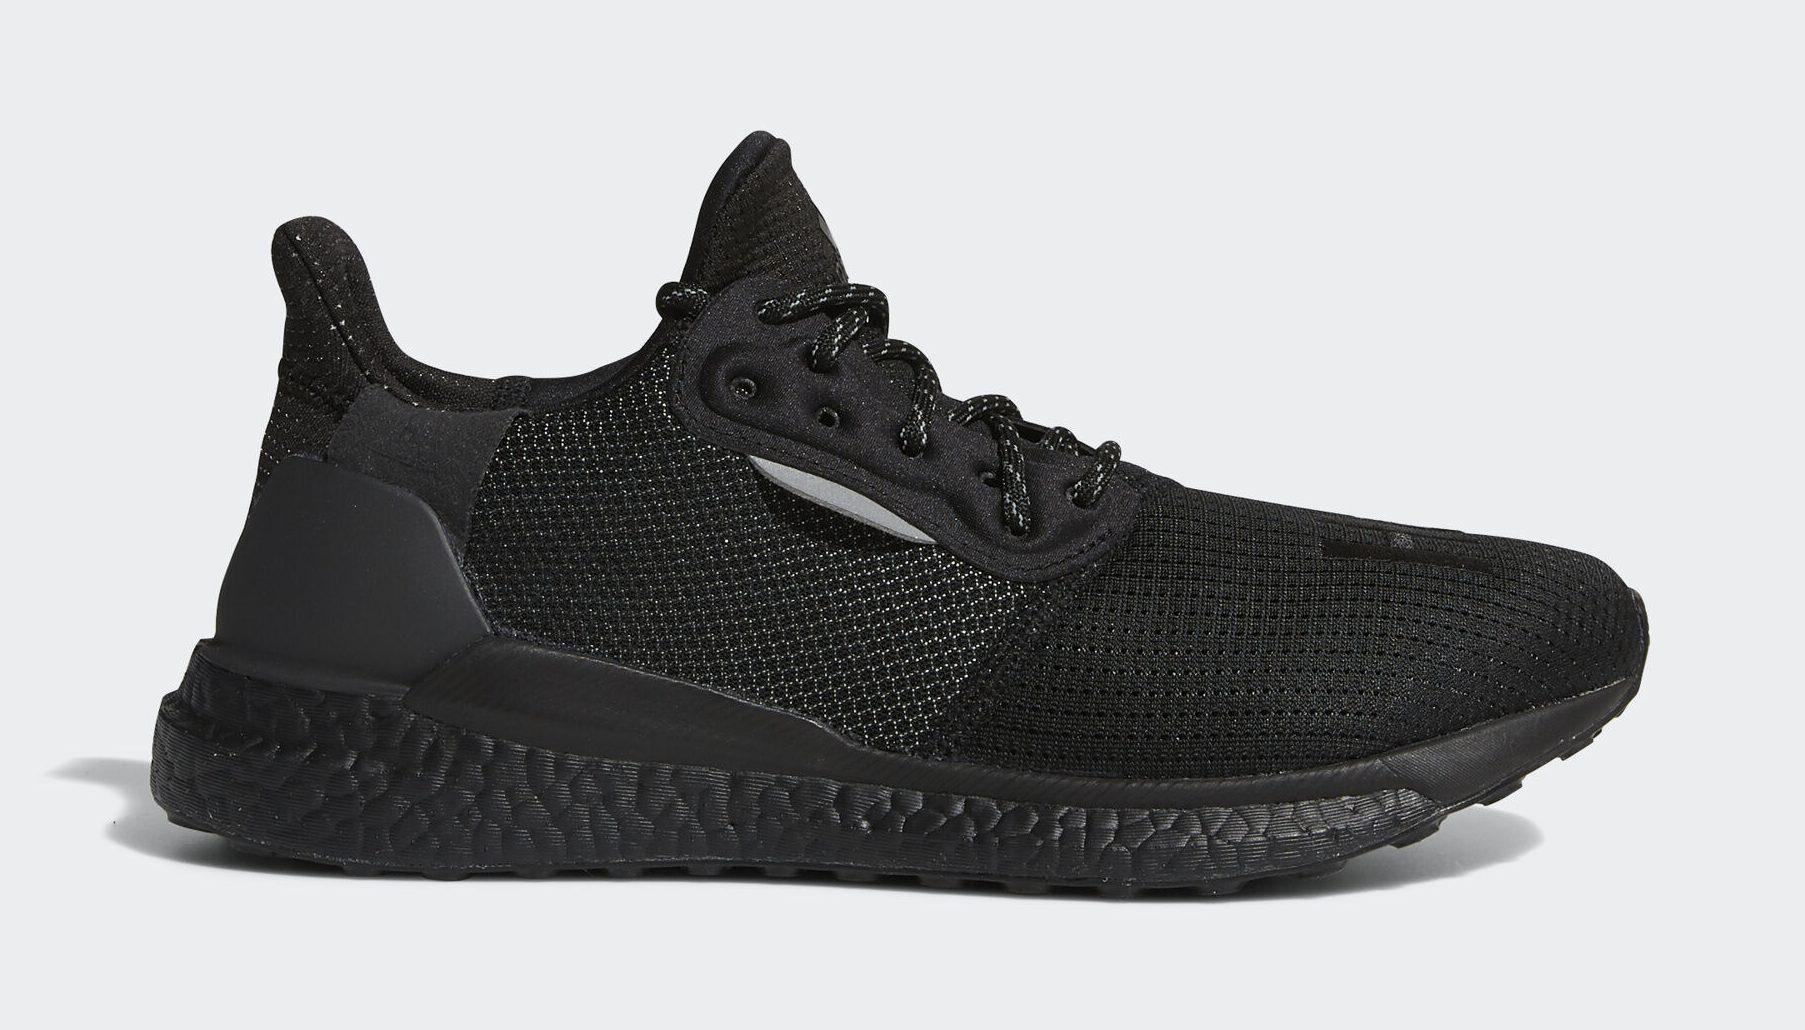 Pharrell's Solar Hu Glide Adidas Shoes